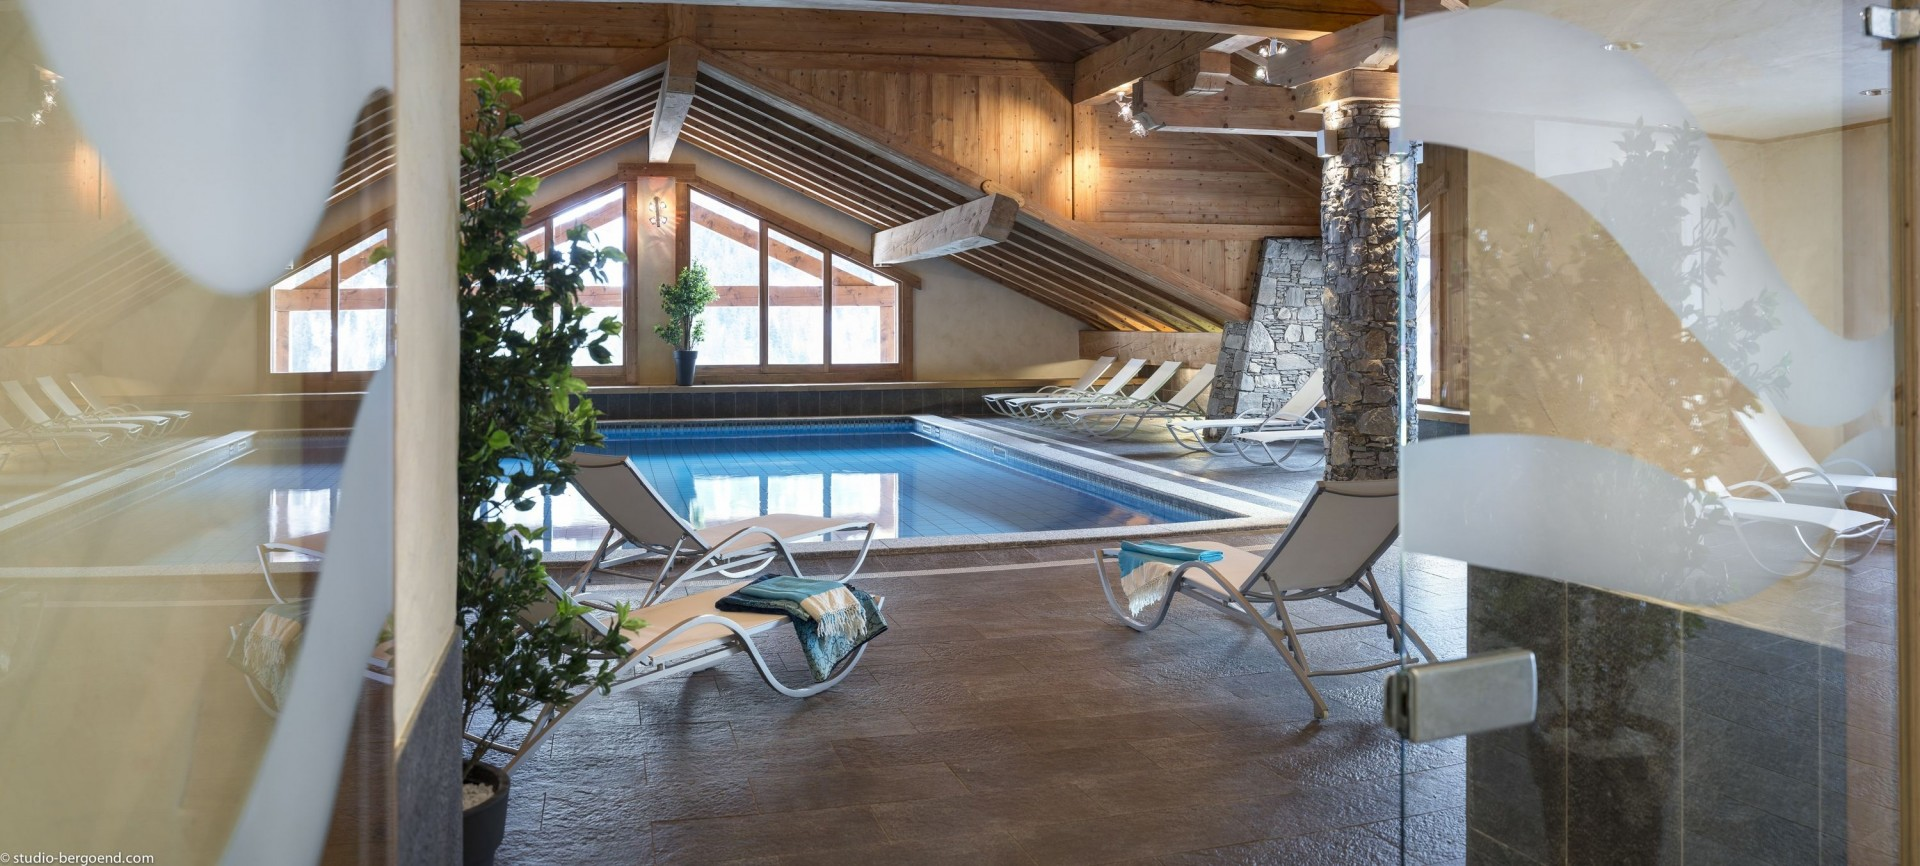 Champagny En Vanoise Location Appartement Luxe Chapminite Piscine